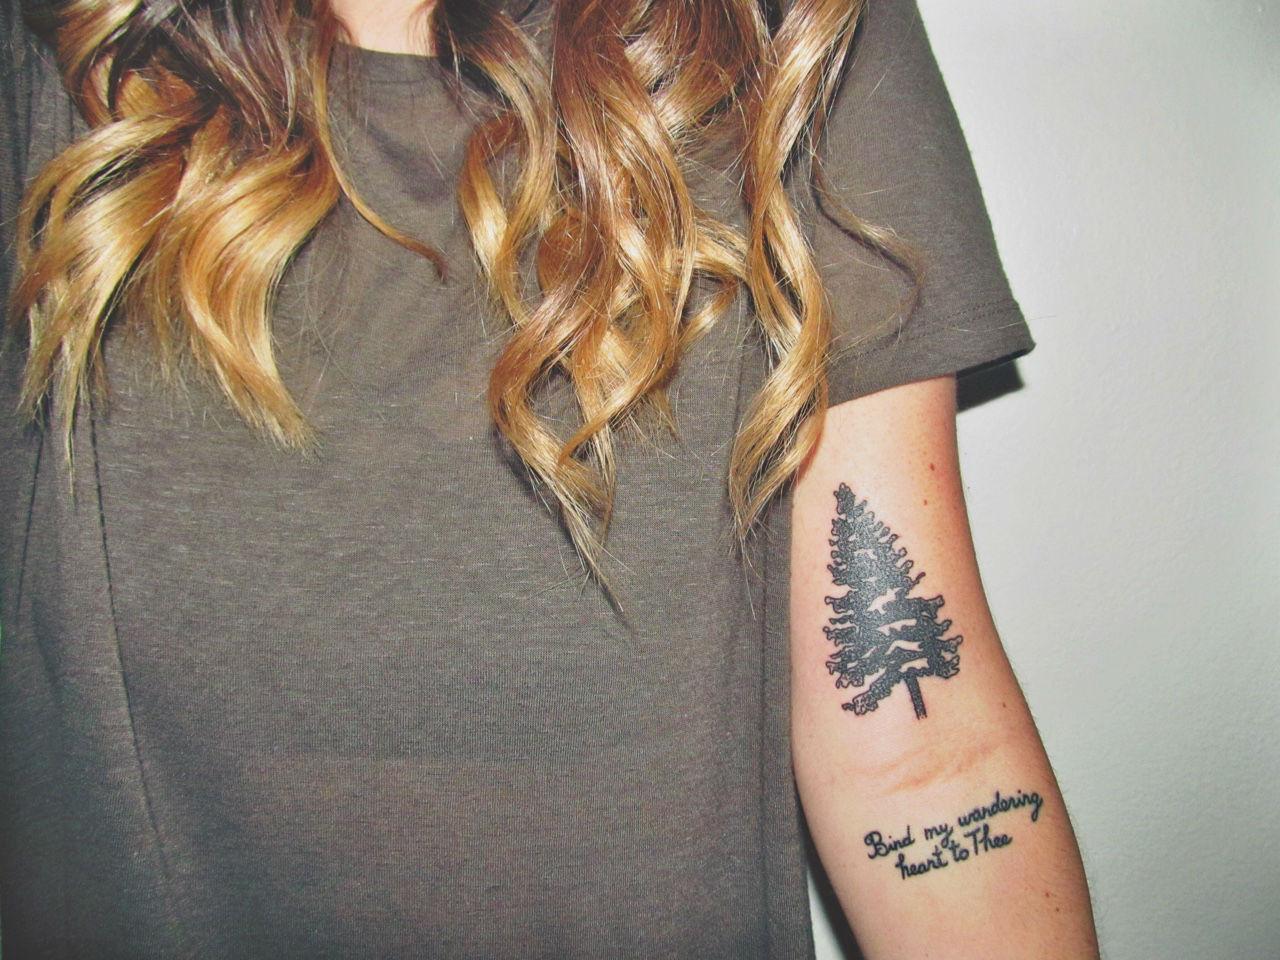 22 Photos of Mystical Pine Tree Tattoos - Sortra